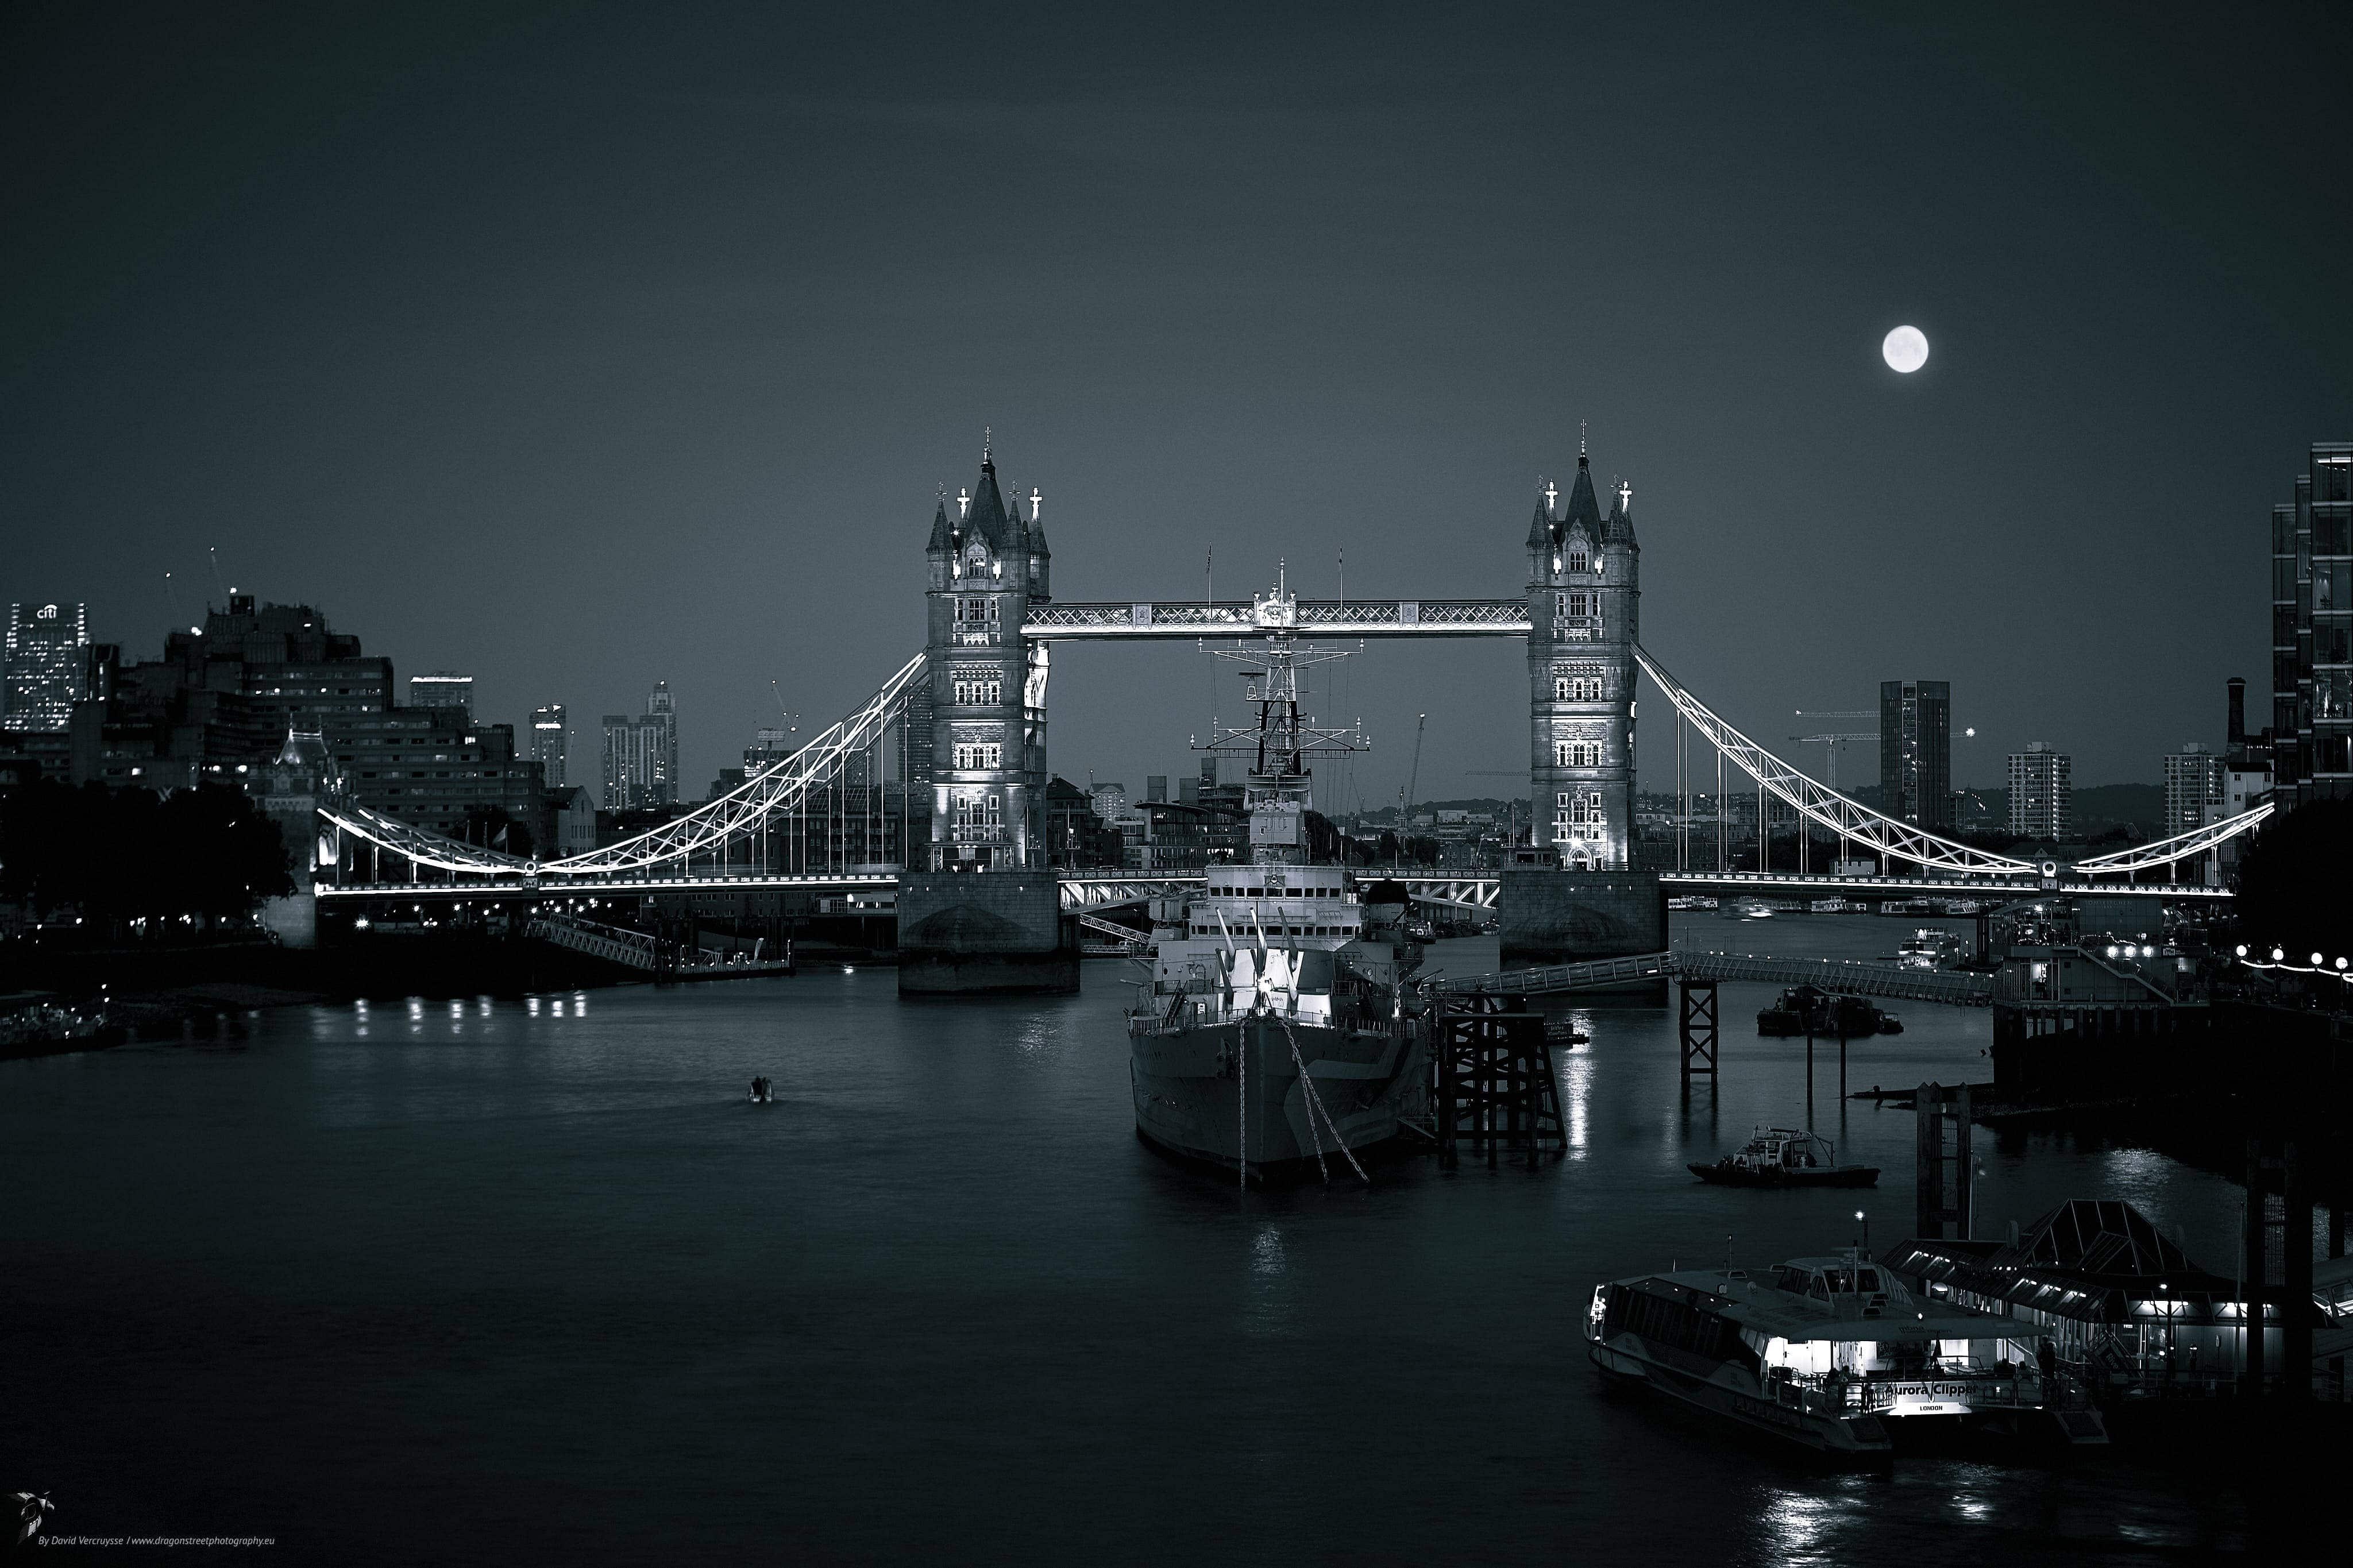 Tower Bridge by night, Londres, Angleterre